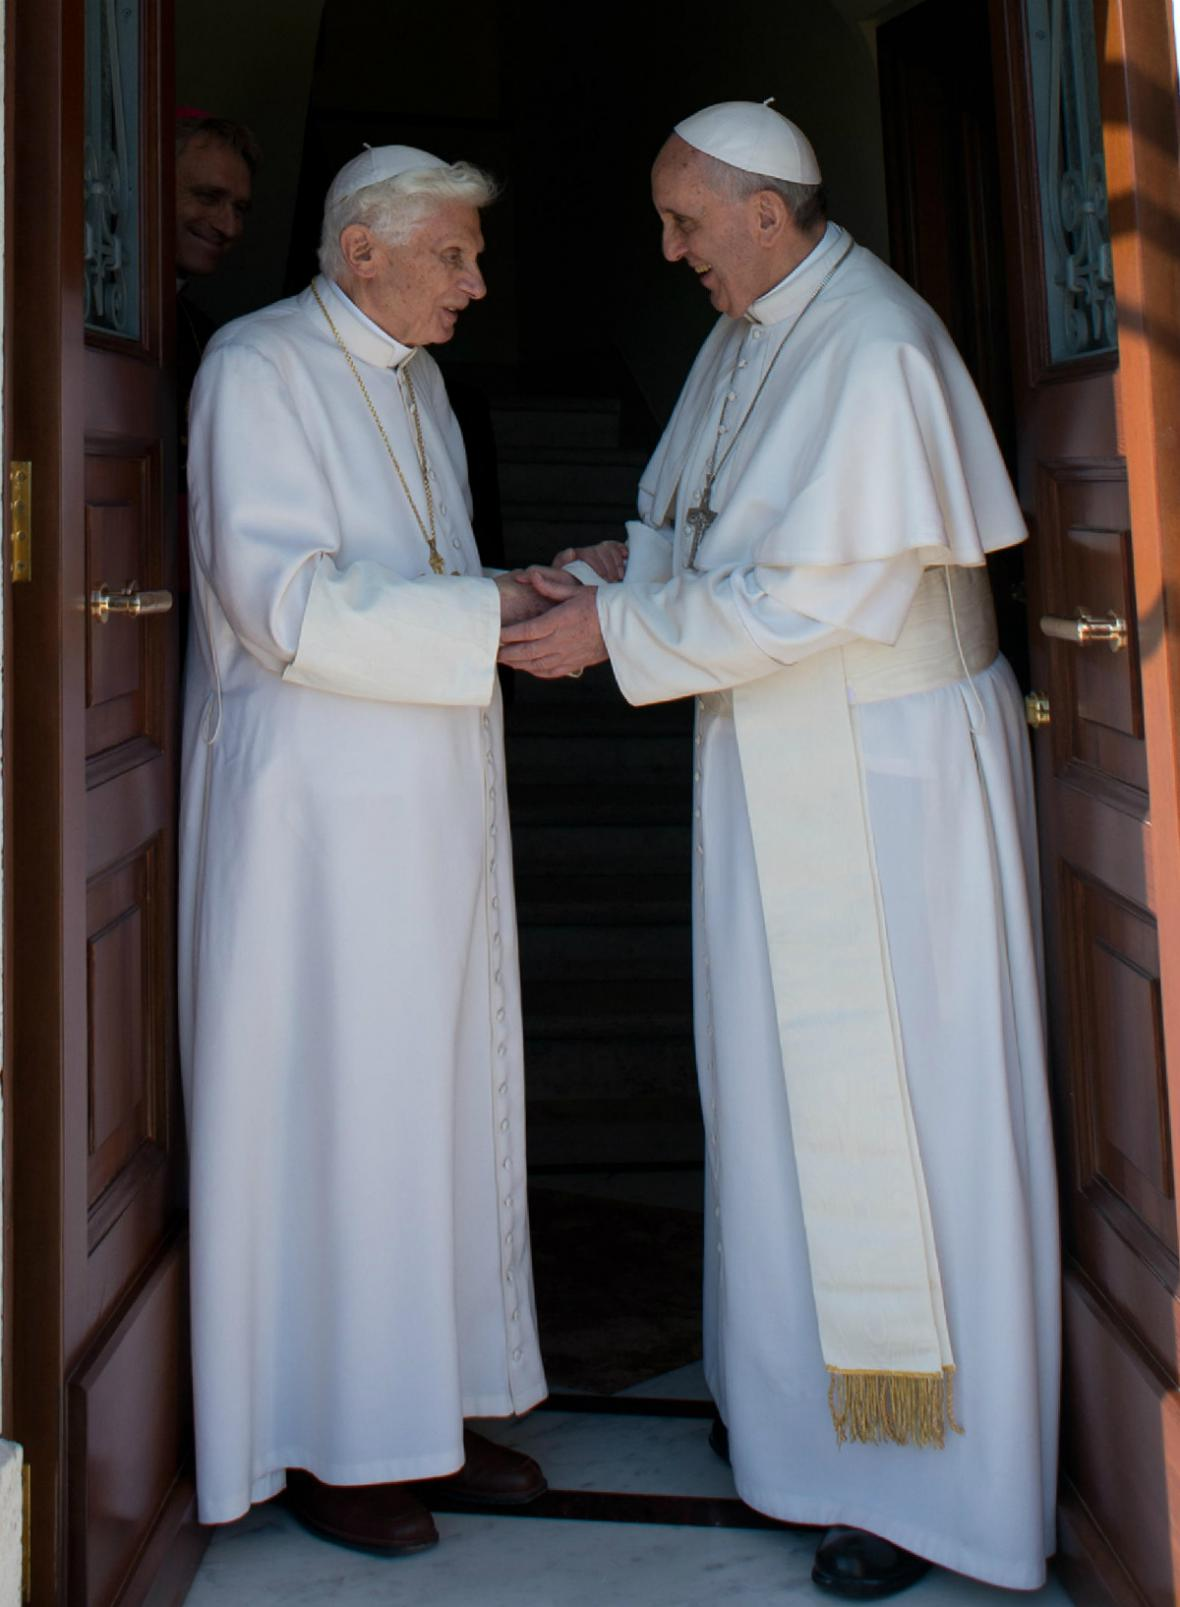 Dva papežové va Vatikánu. František vítá Benedikta